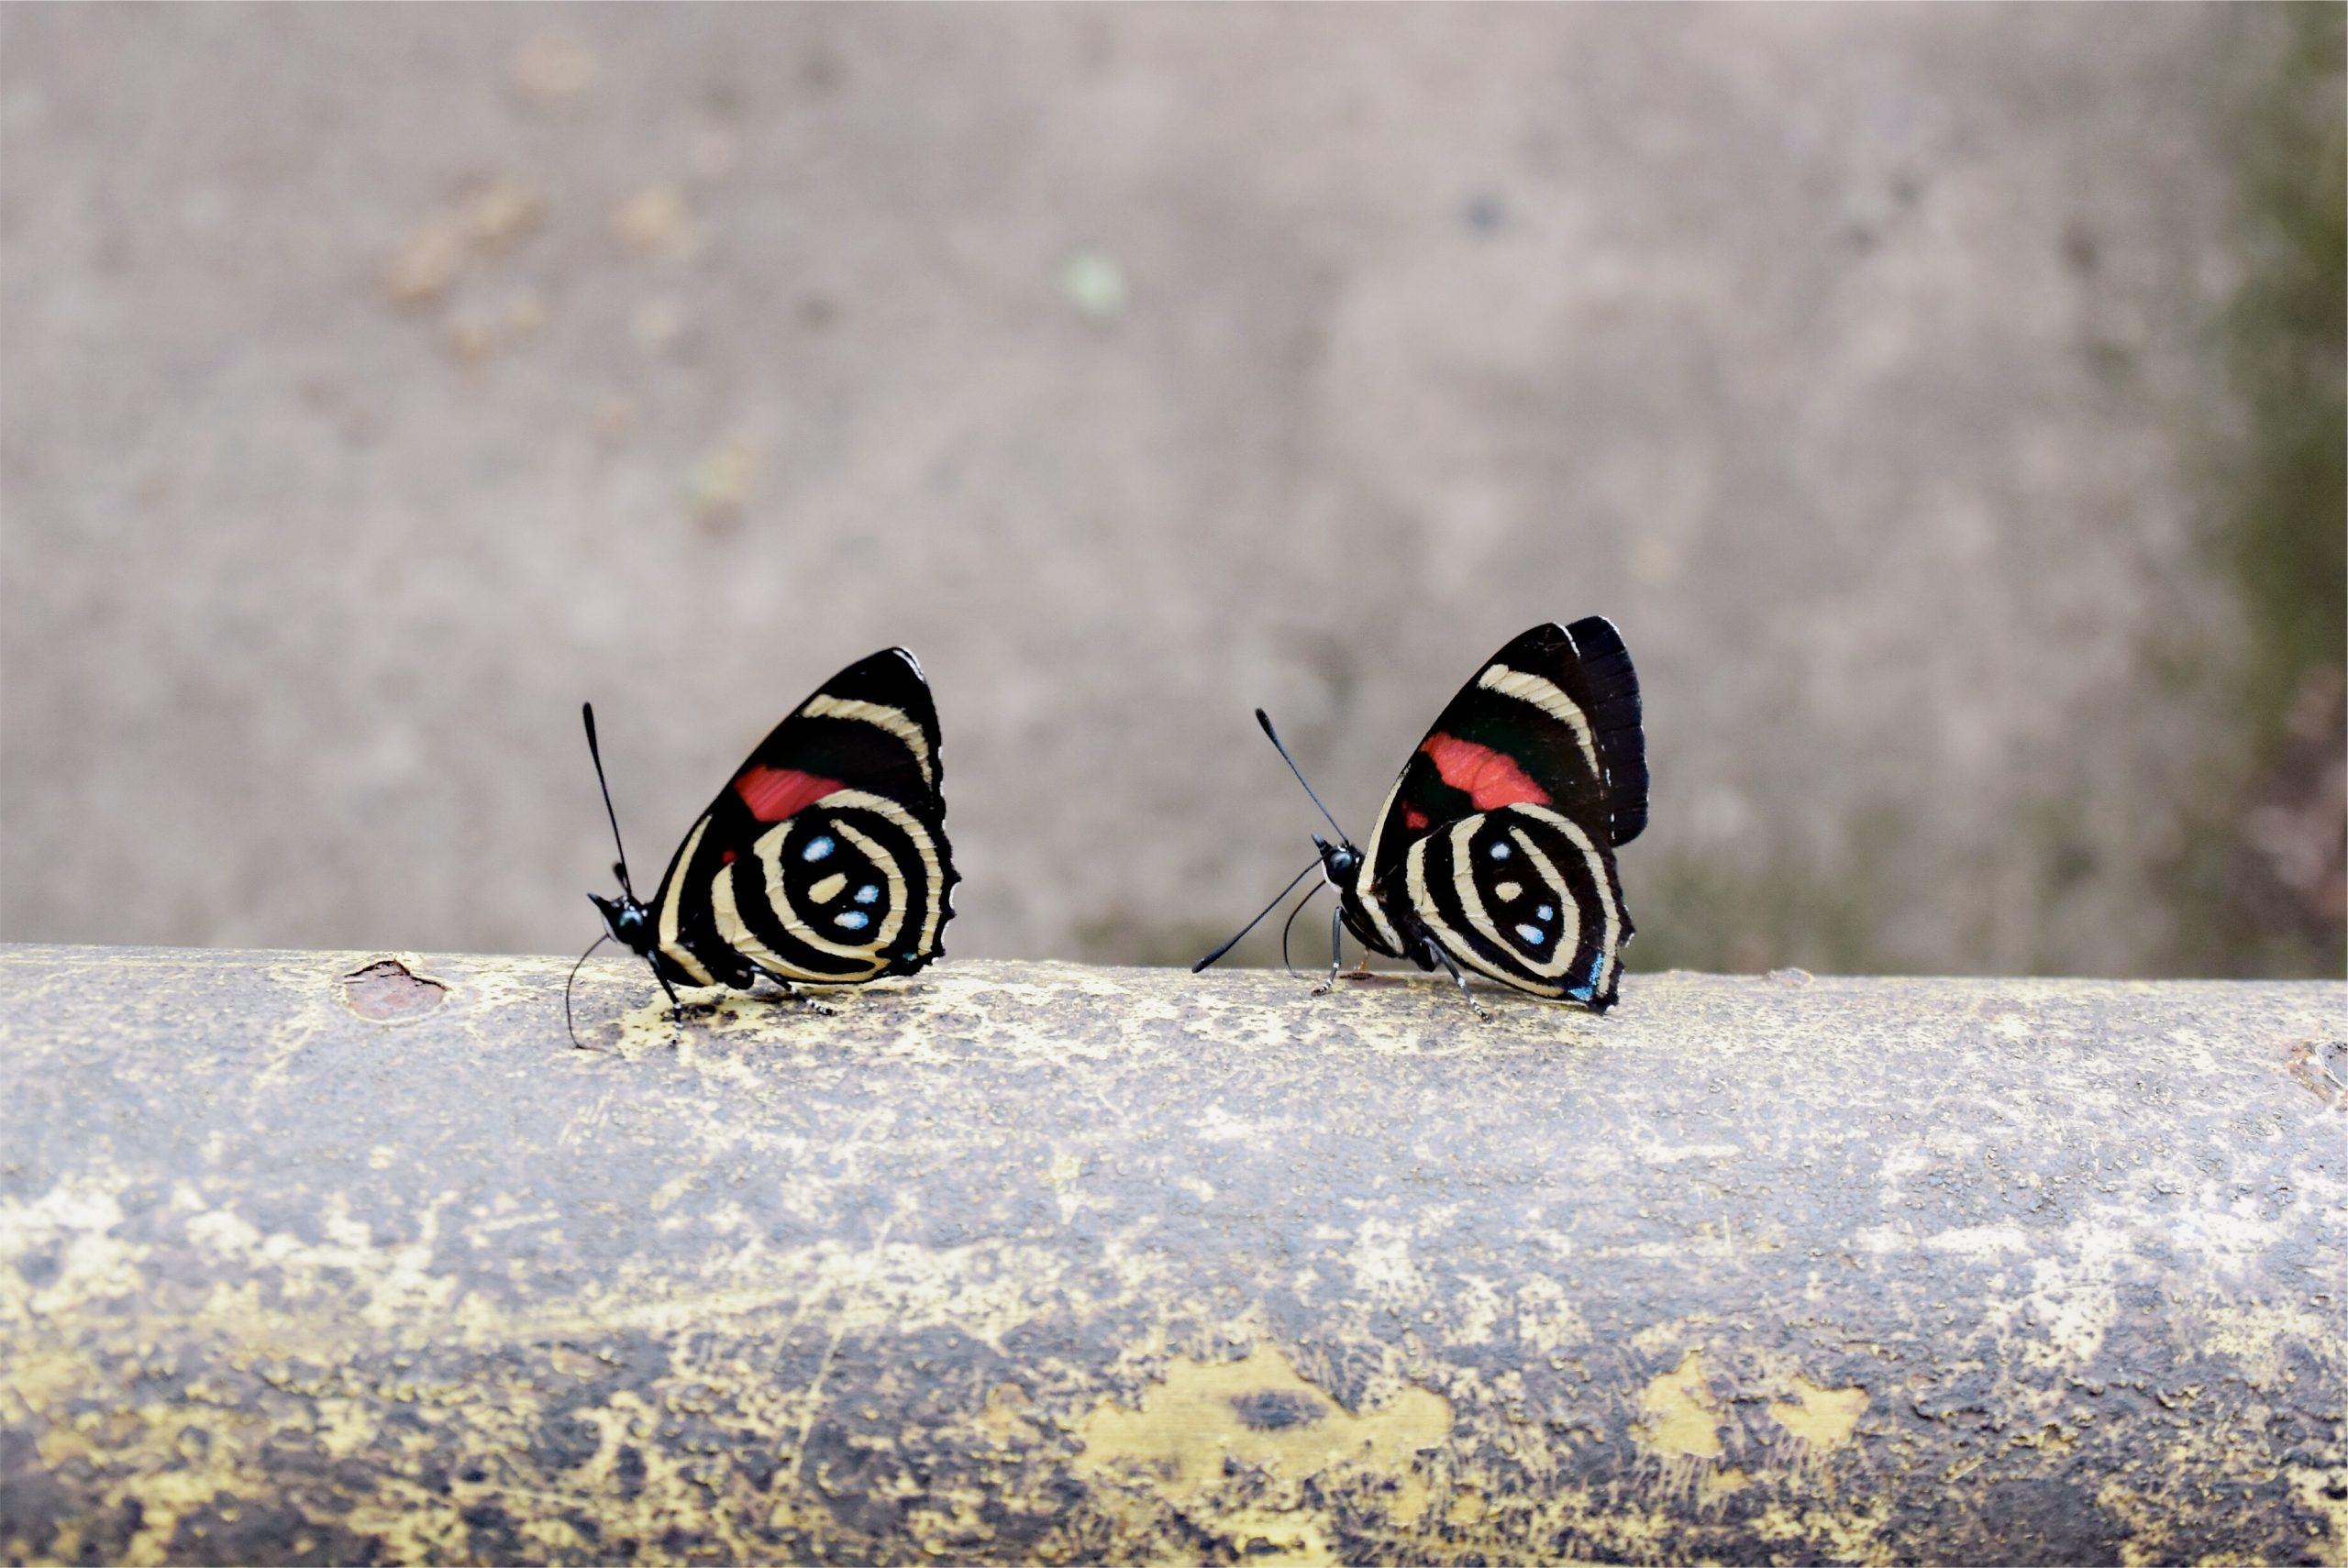 Two butterflies depicting duplicate content